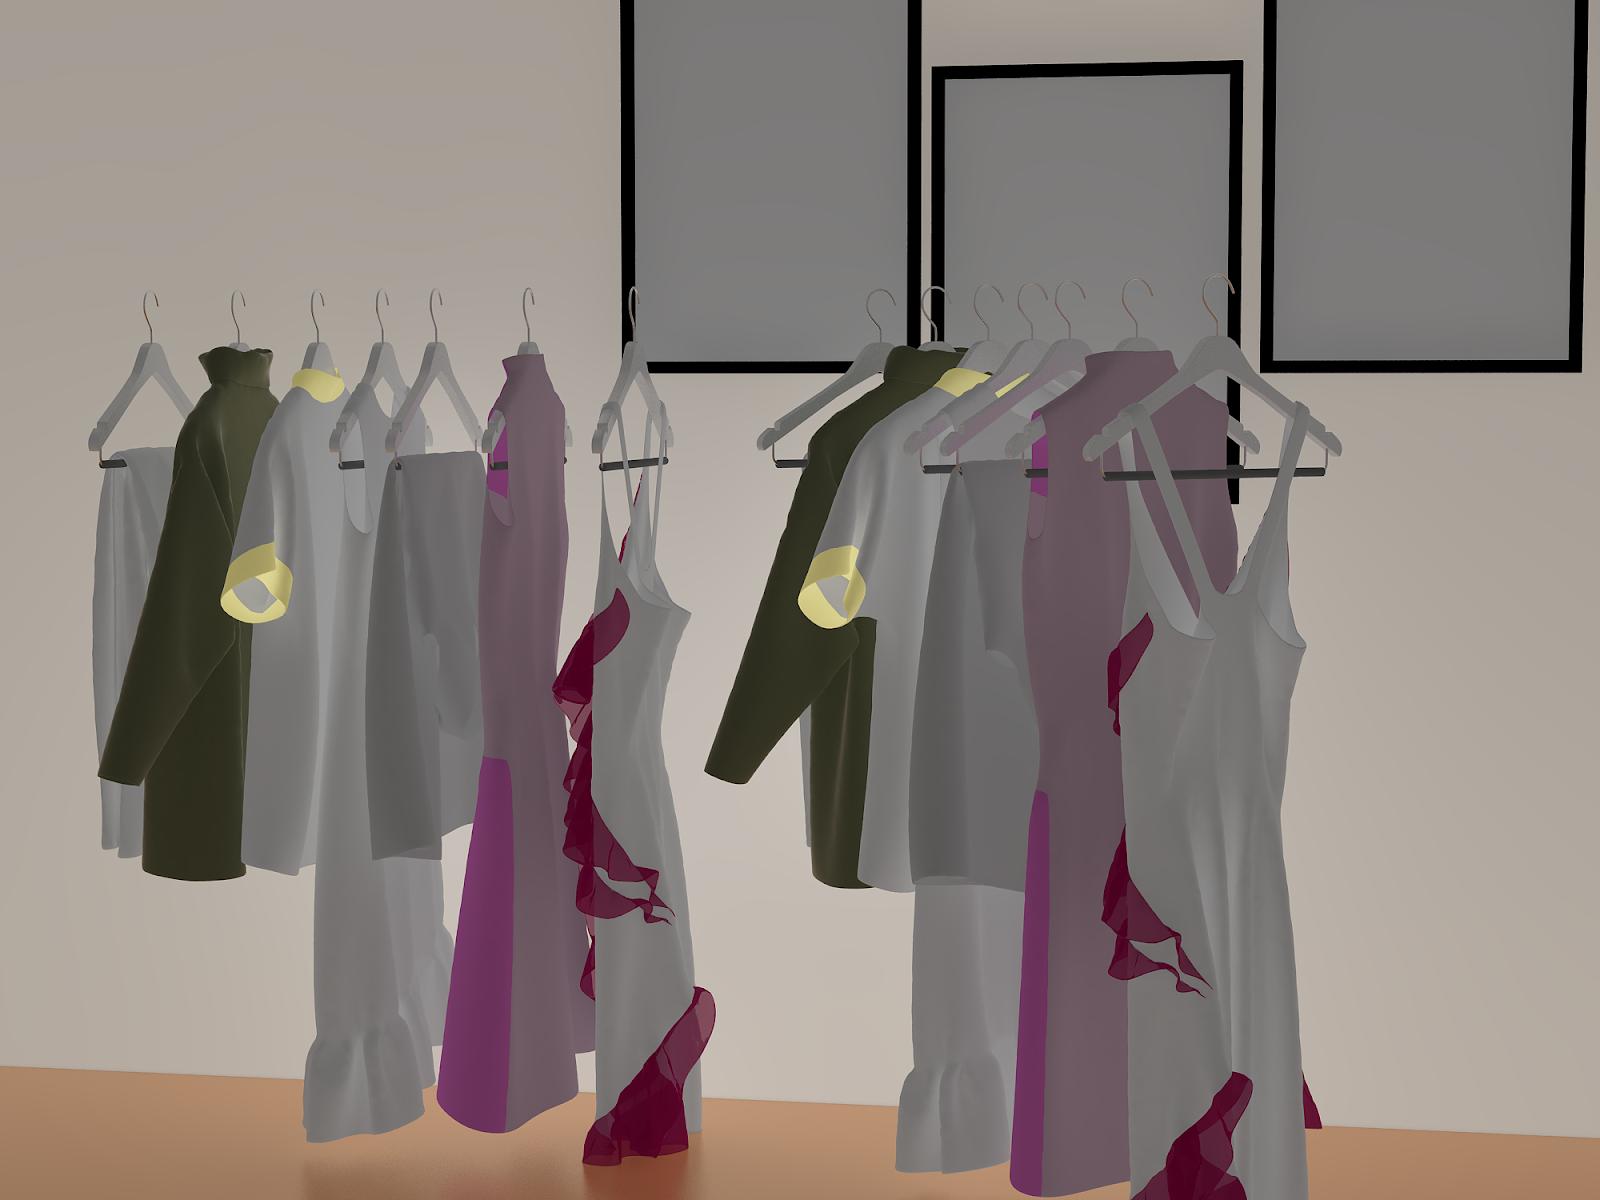 3D Kıyafet Modelleri